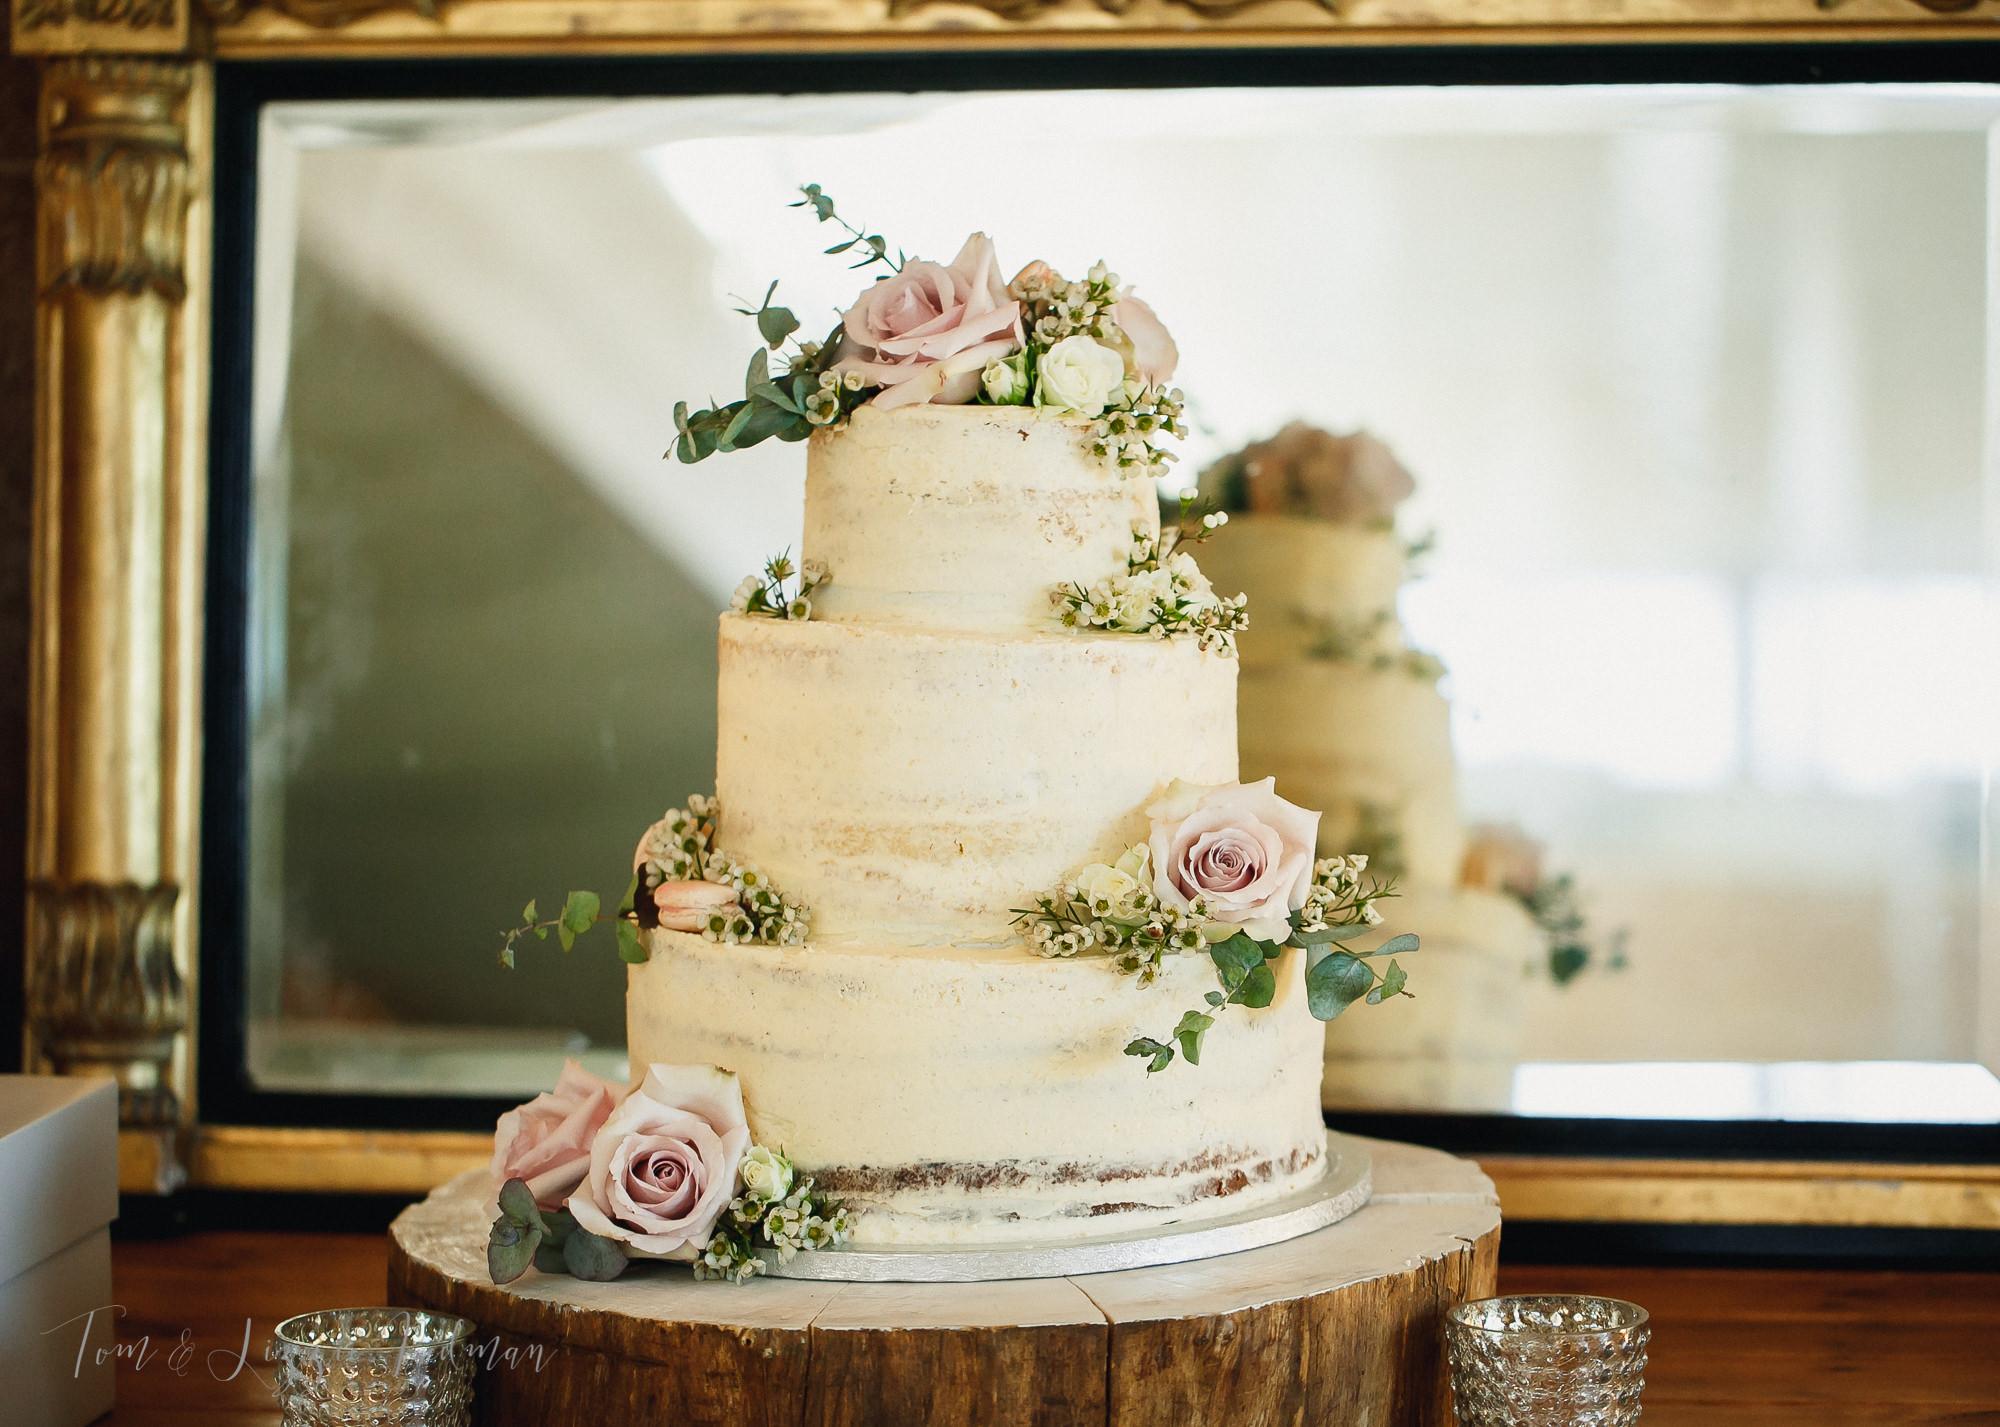 Dorset wedding photographers Tom & Lizzie Redman 038.jpg